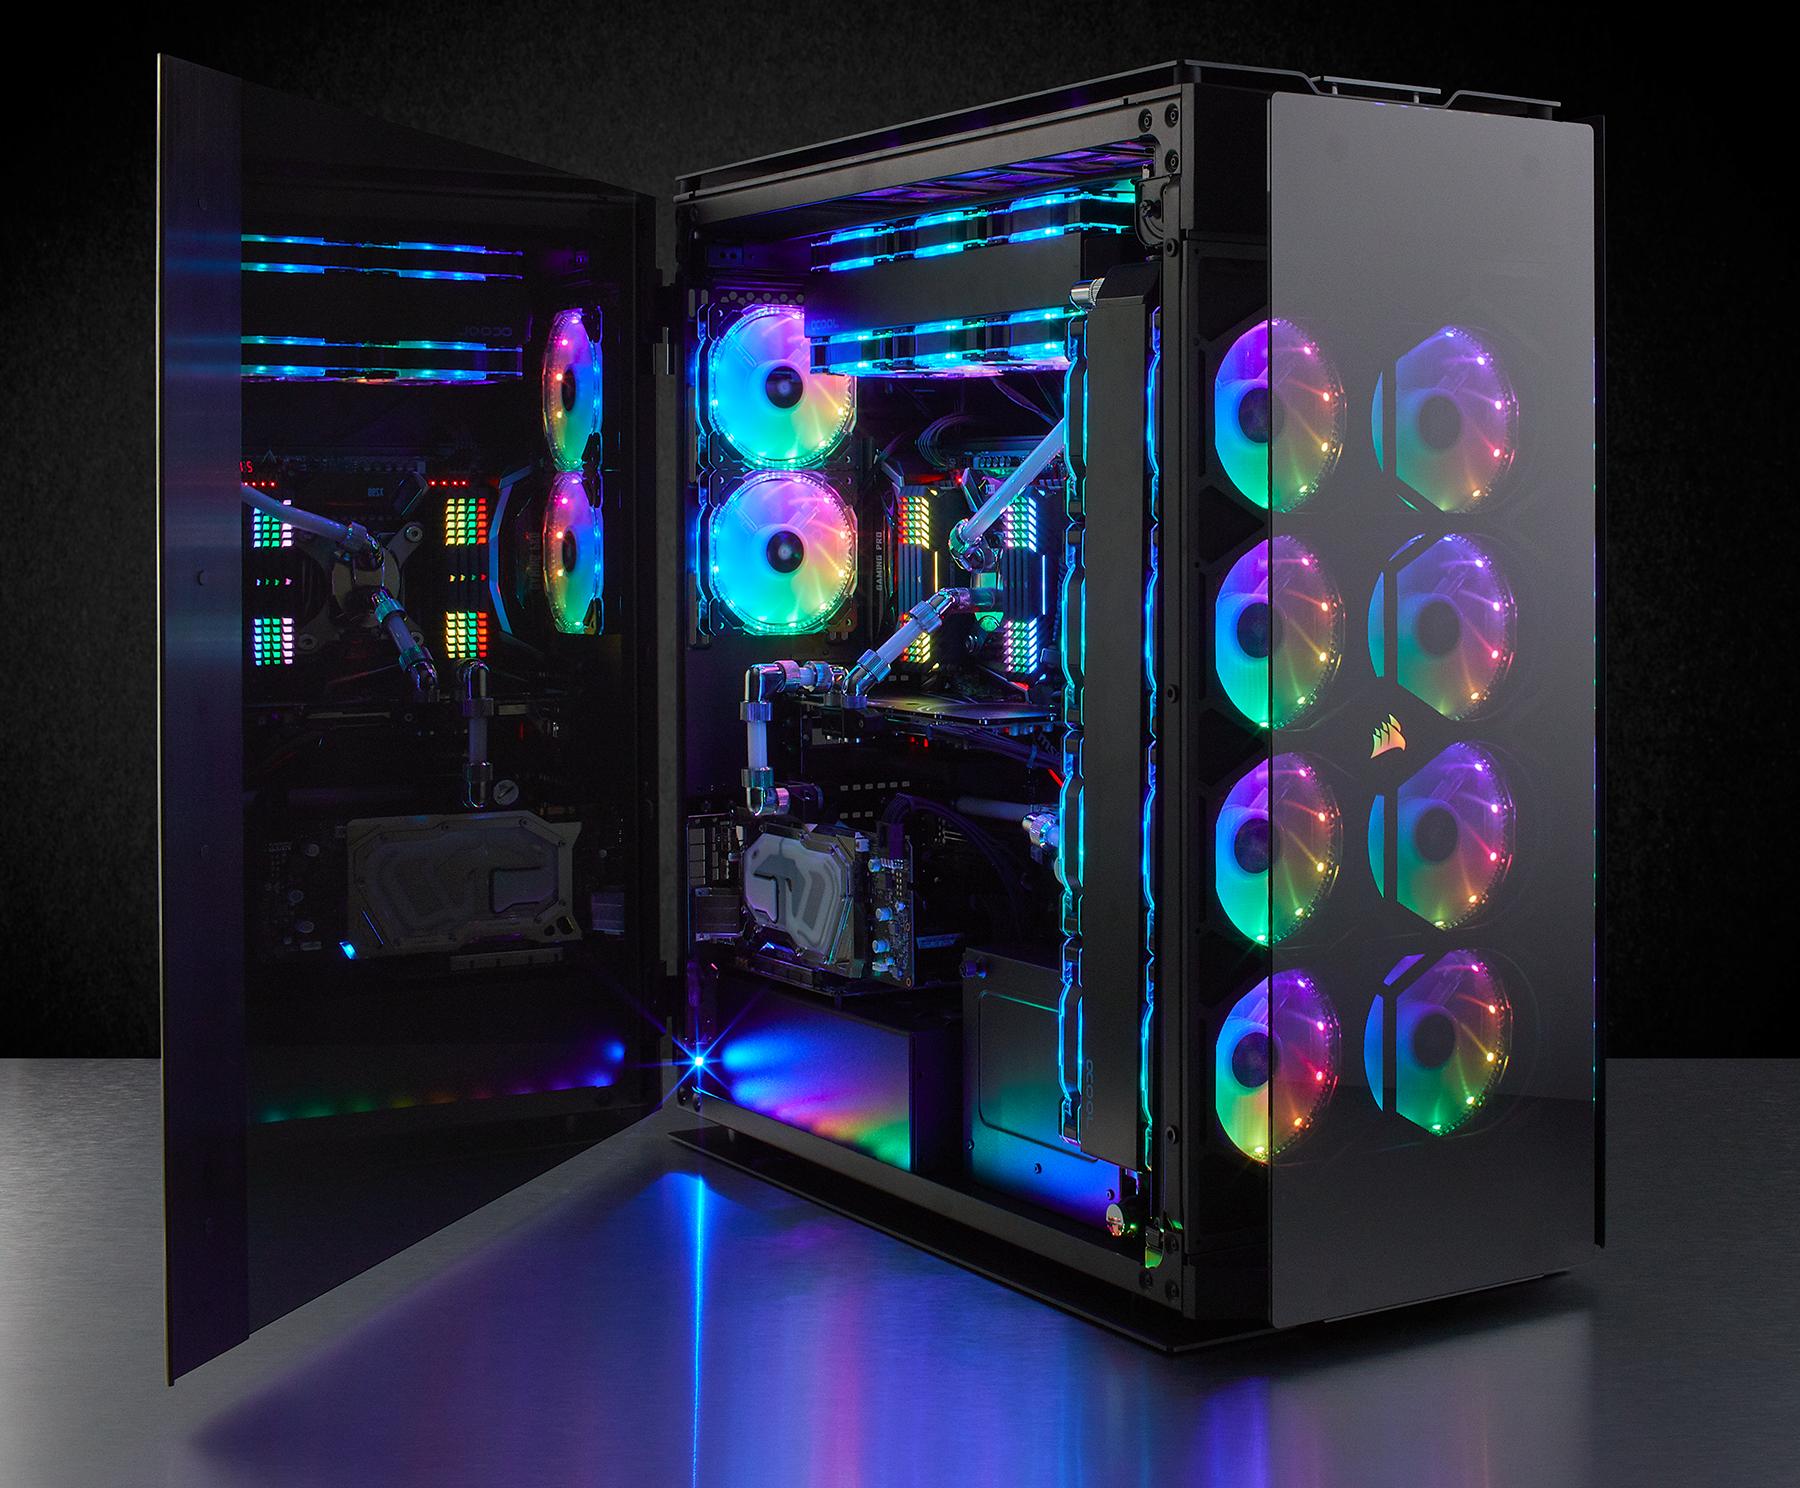 CORSAIR Launches Obsidian 1000D Super-Tower PC Case